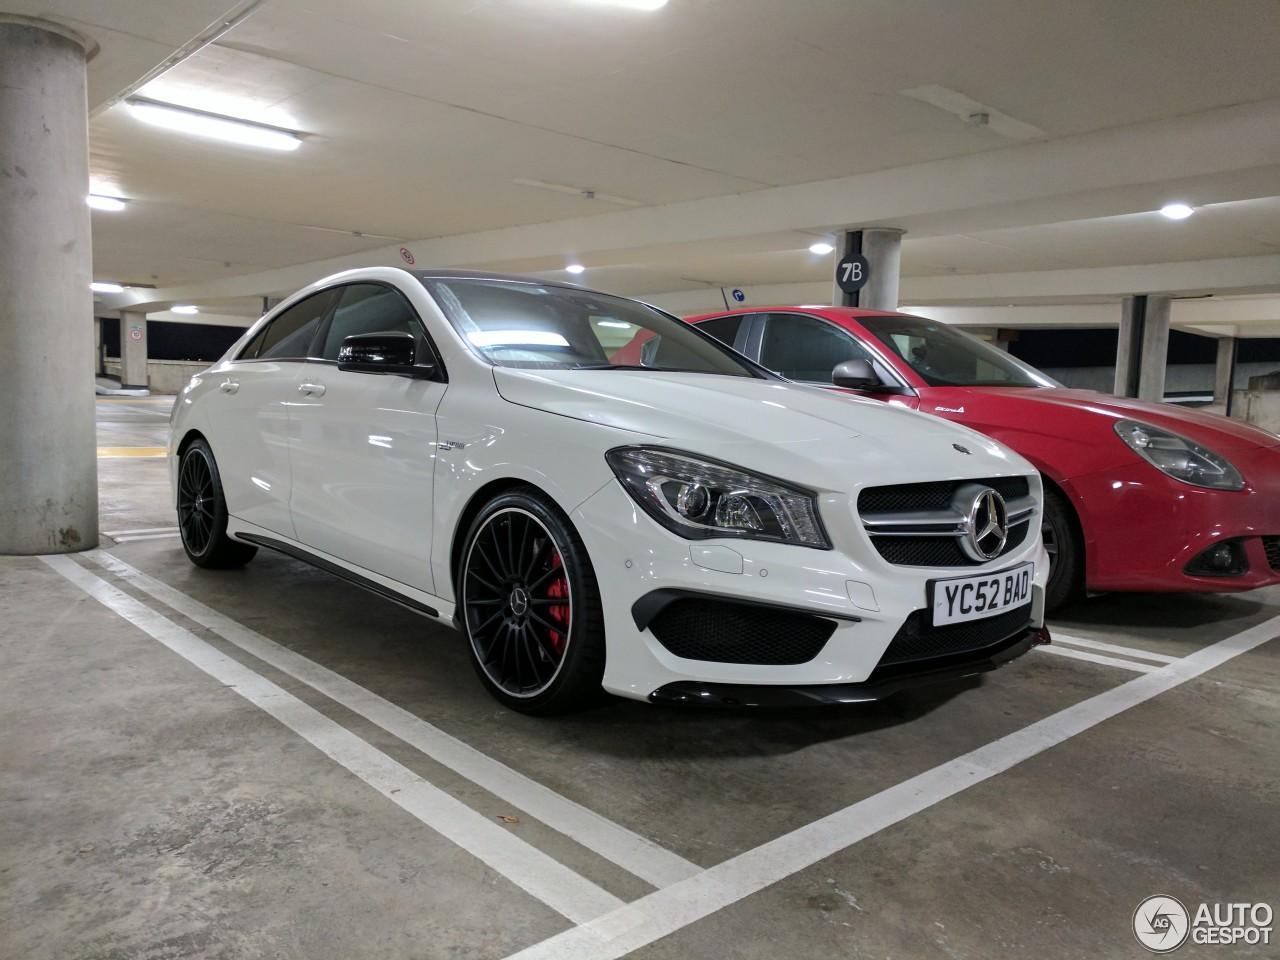 Mercedes benz cla 45 amg c117 11 february 2017 autogespot for Mercedes benz cla 2017